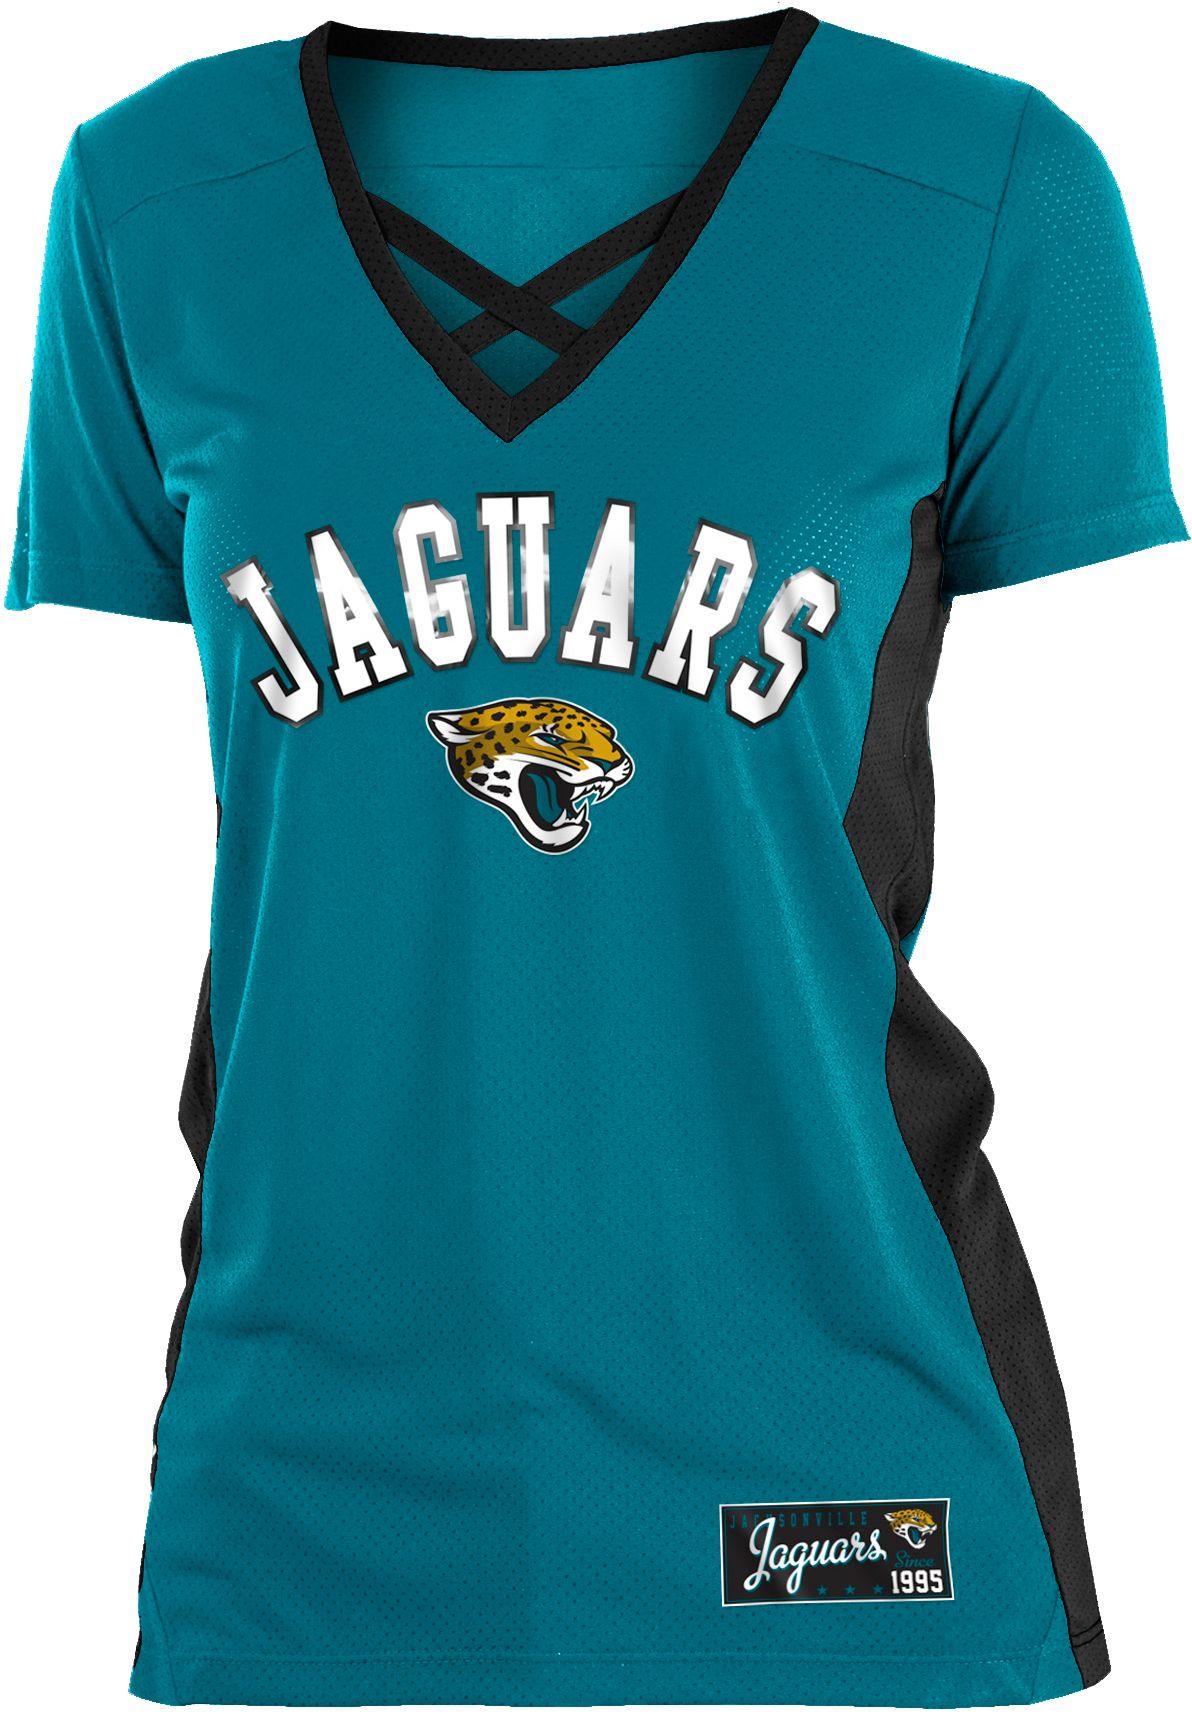 jacksonville jaguars women's shirts